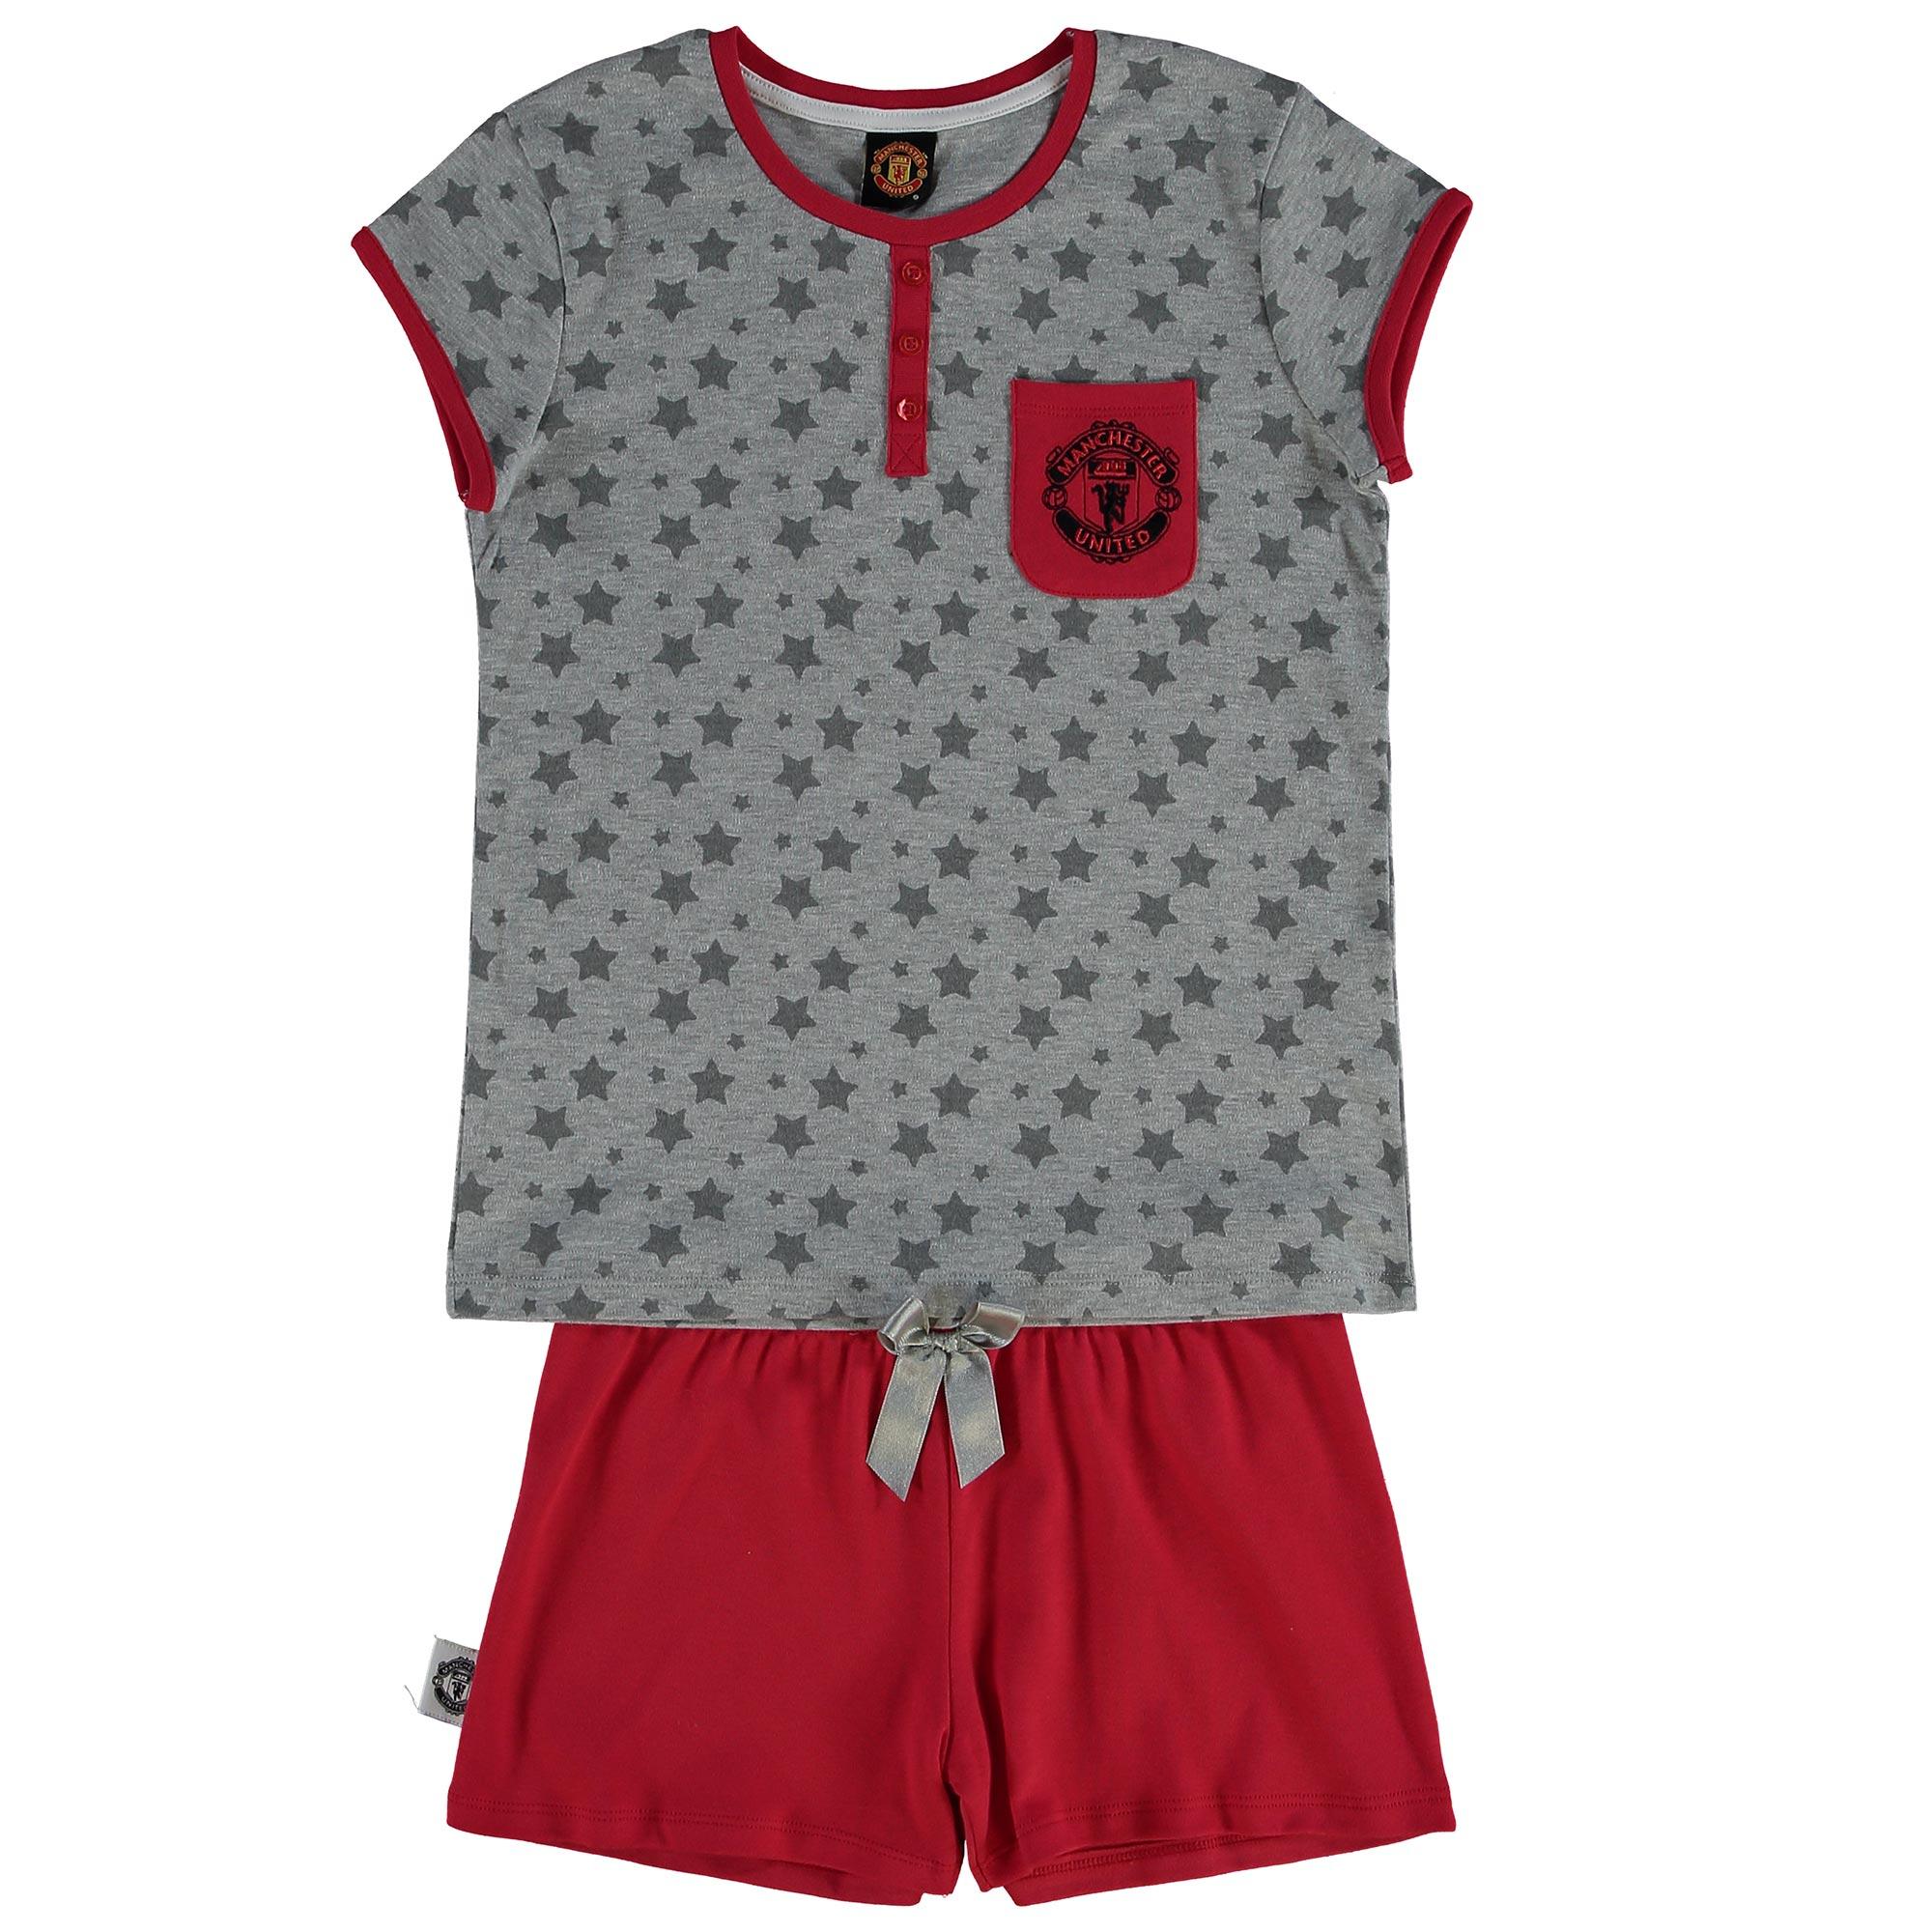 Manchester United Star Print Shortie Pyjamas - Grey Marl/Red - Older G